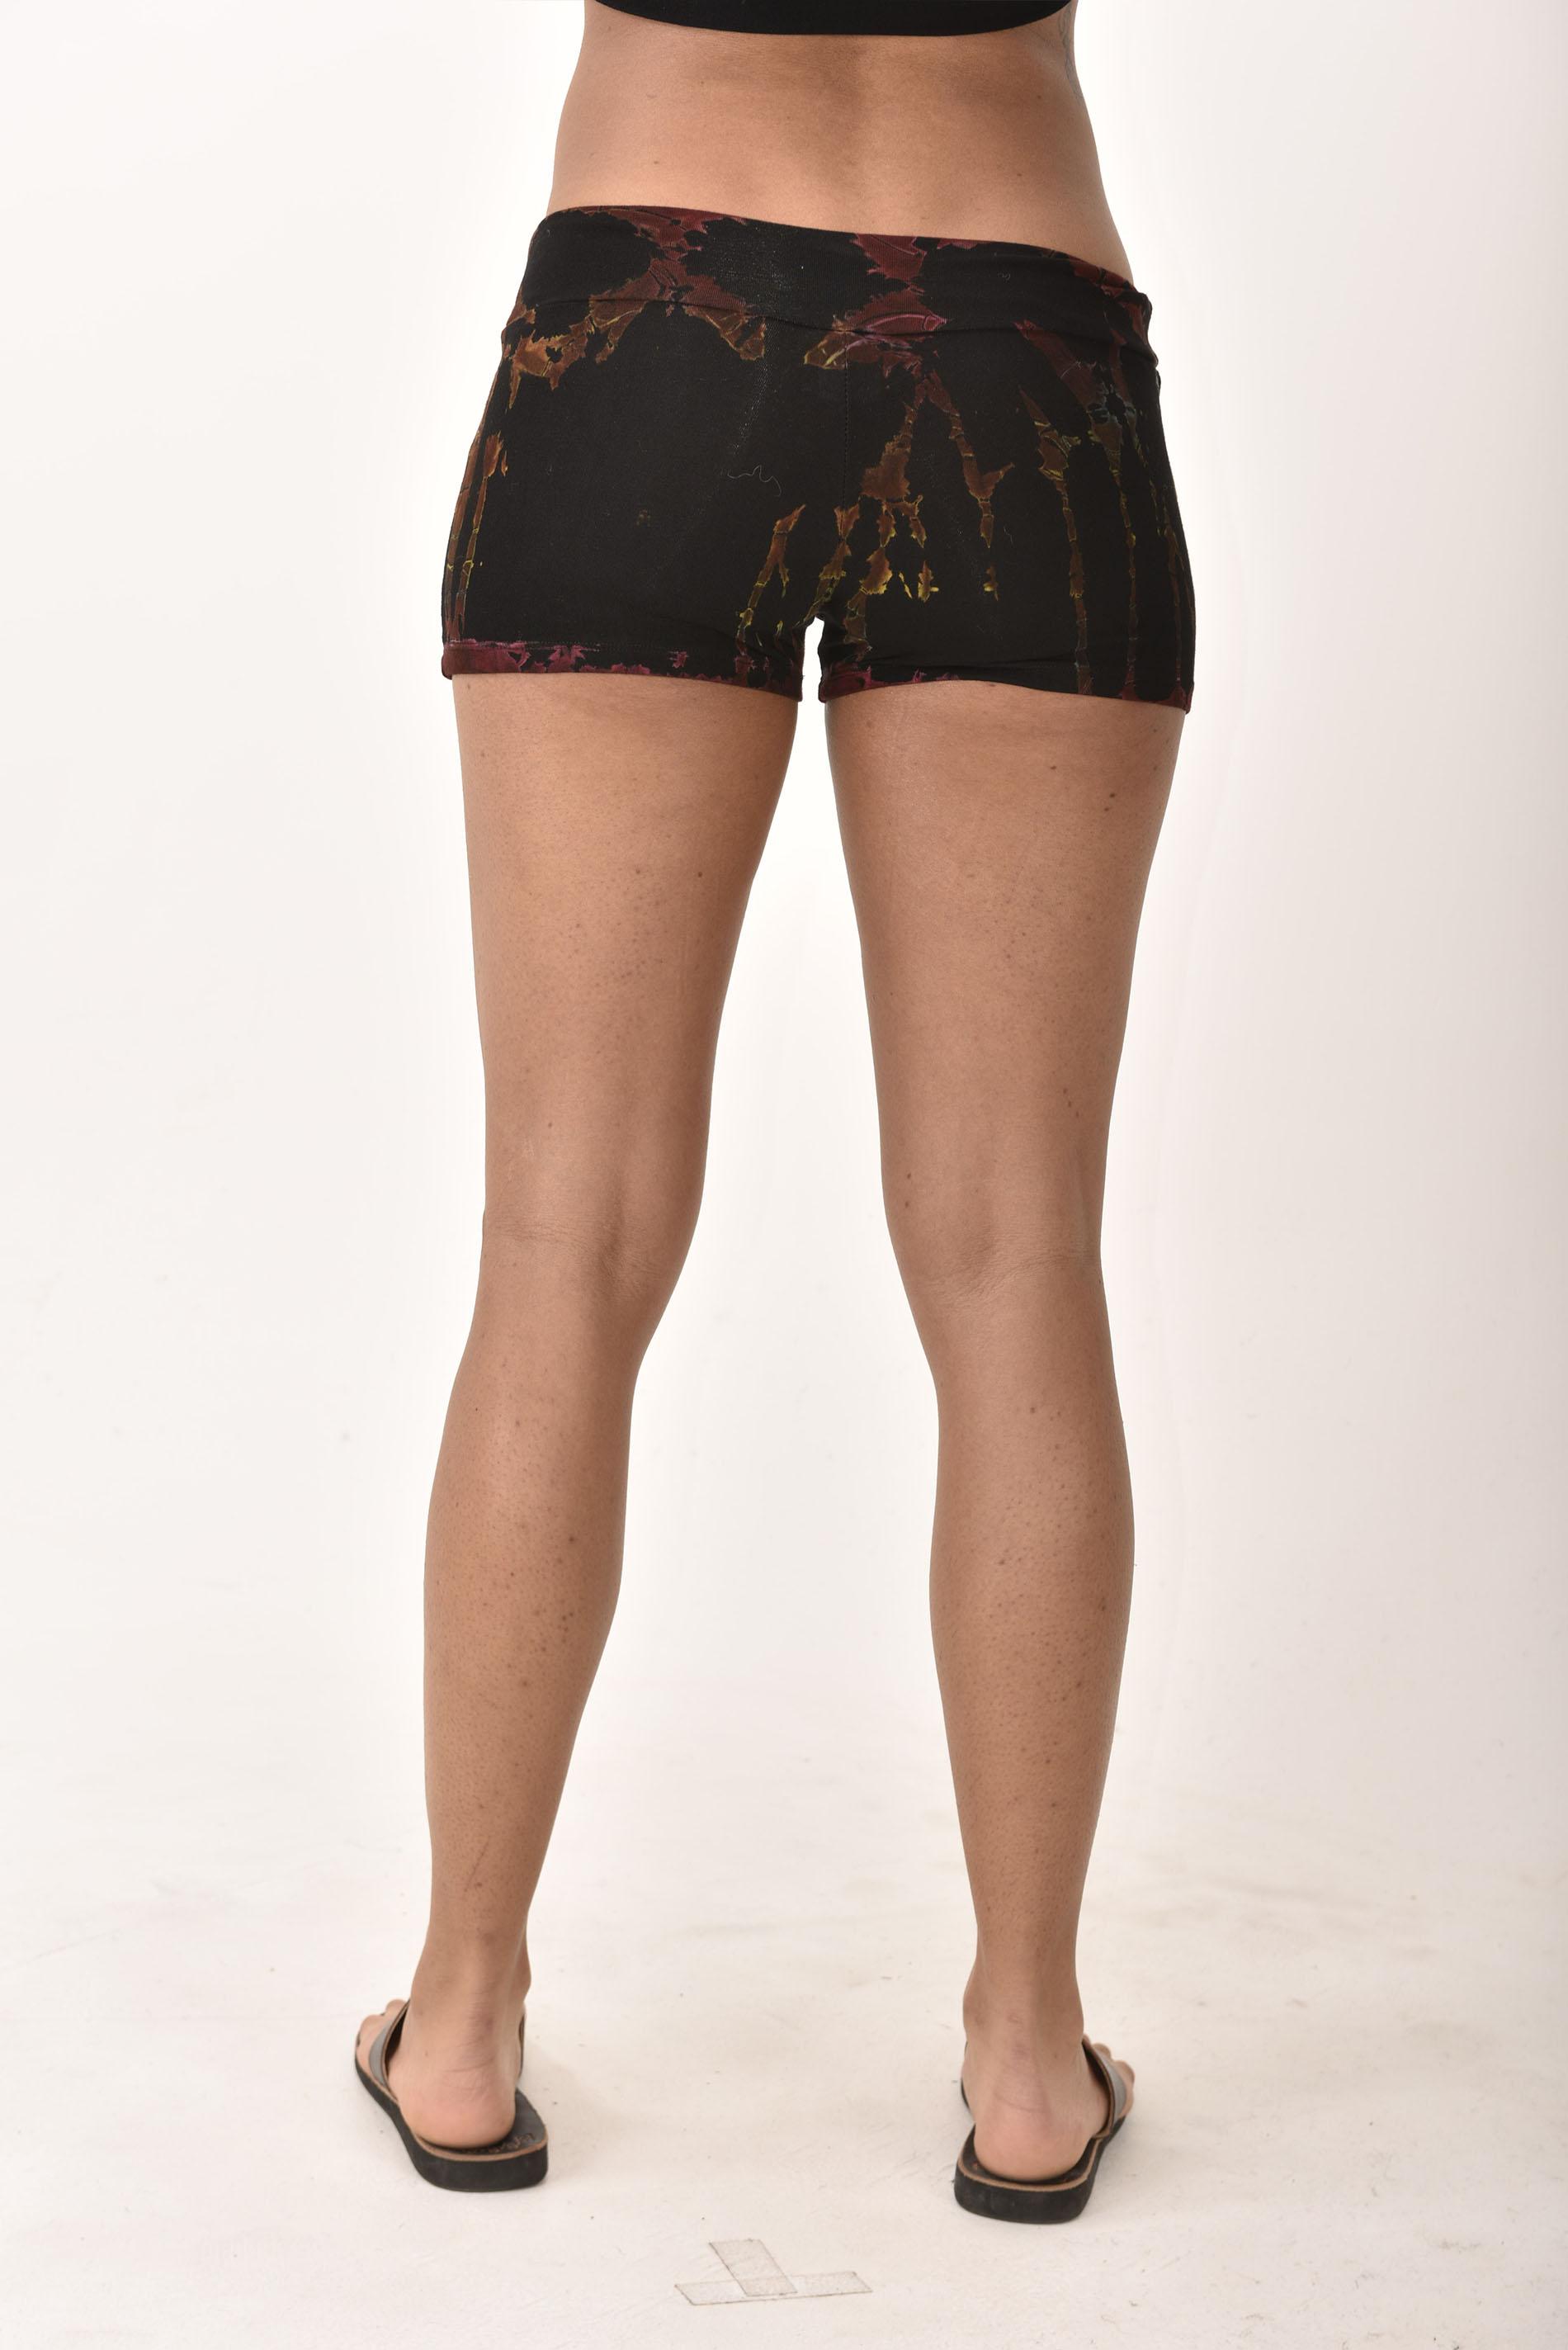 Mini Shorts, Hand Painted Tie Dye, Black Multi